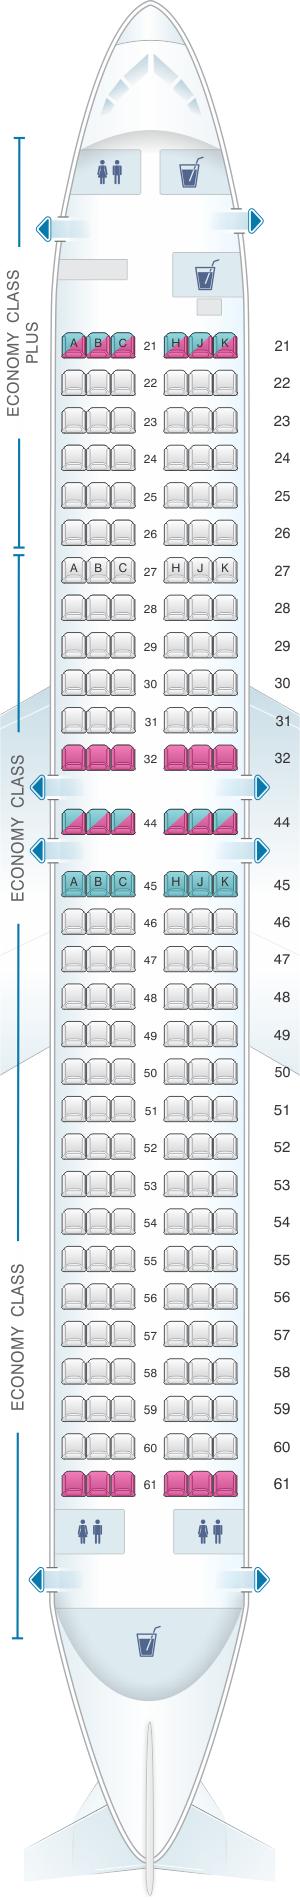 Seat map for El Al Israel Airlines Boeing B737 800 180pax